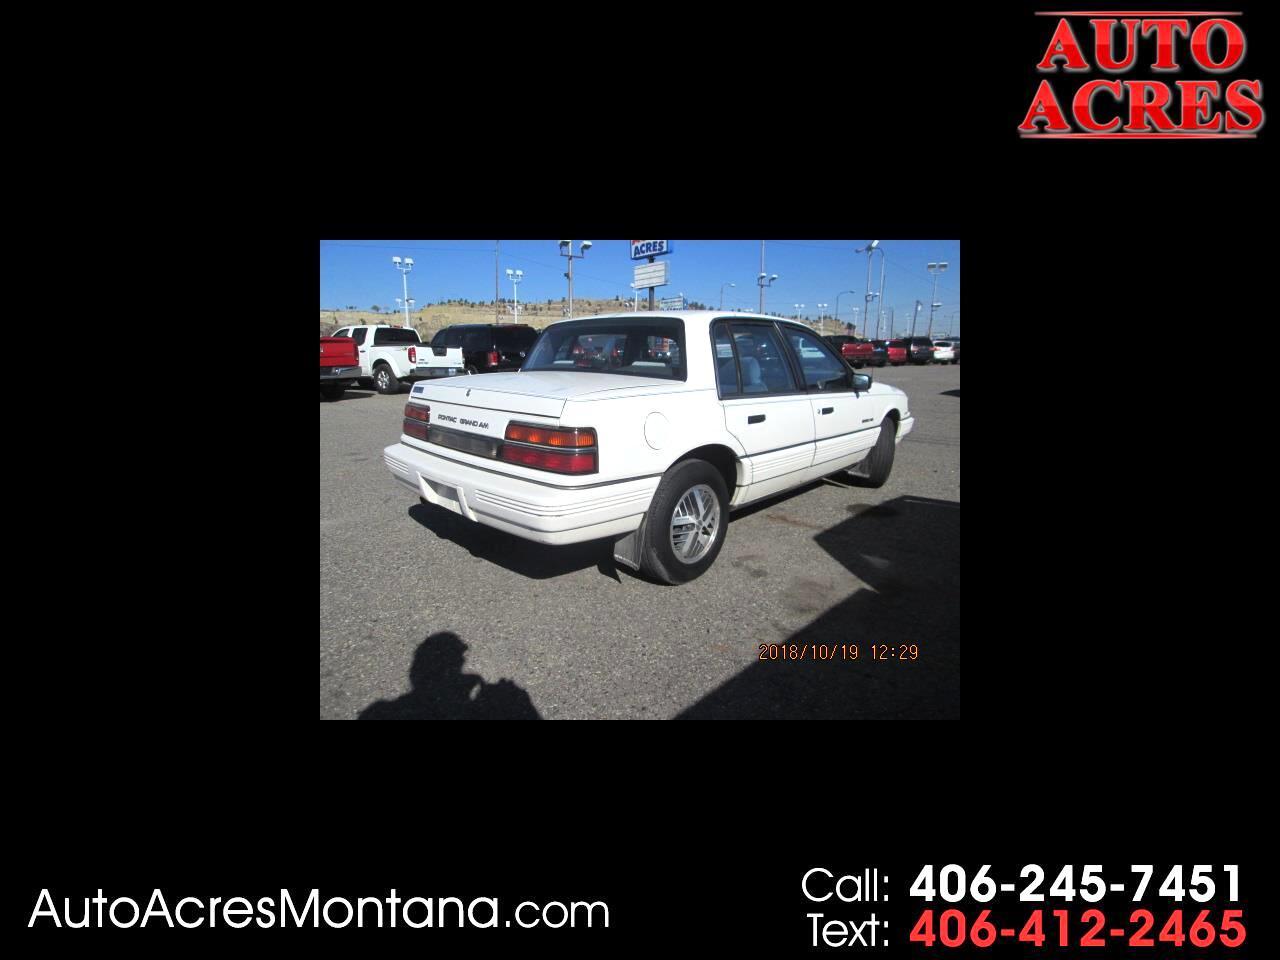 1991 Pontiac Grand Am 4dr Sedan LE